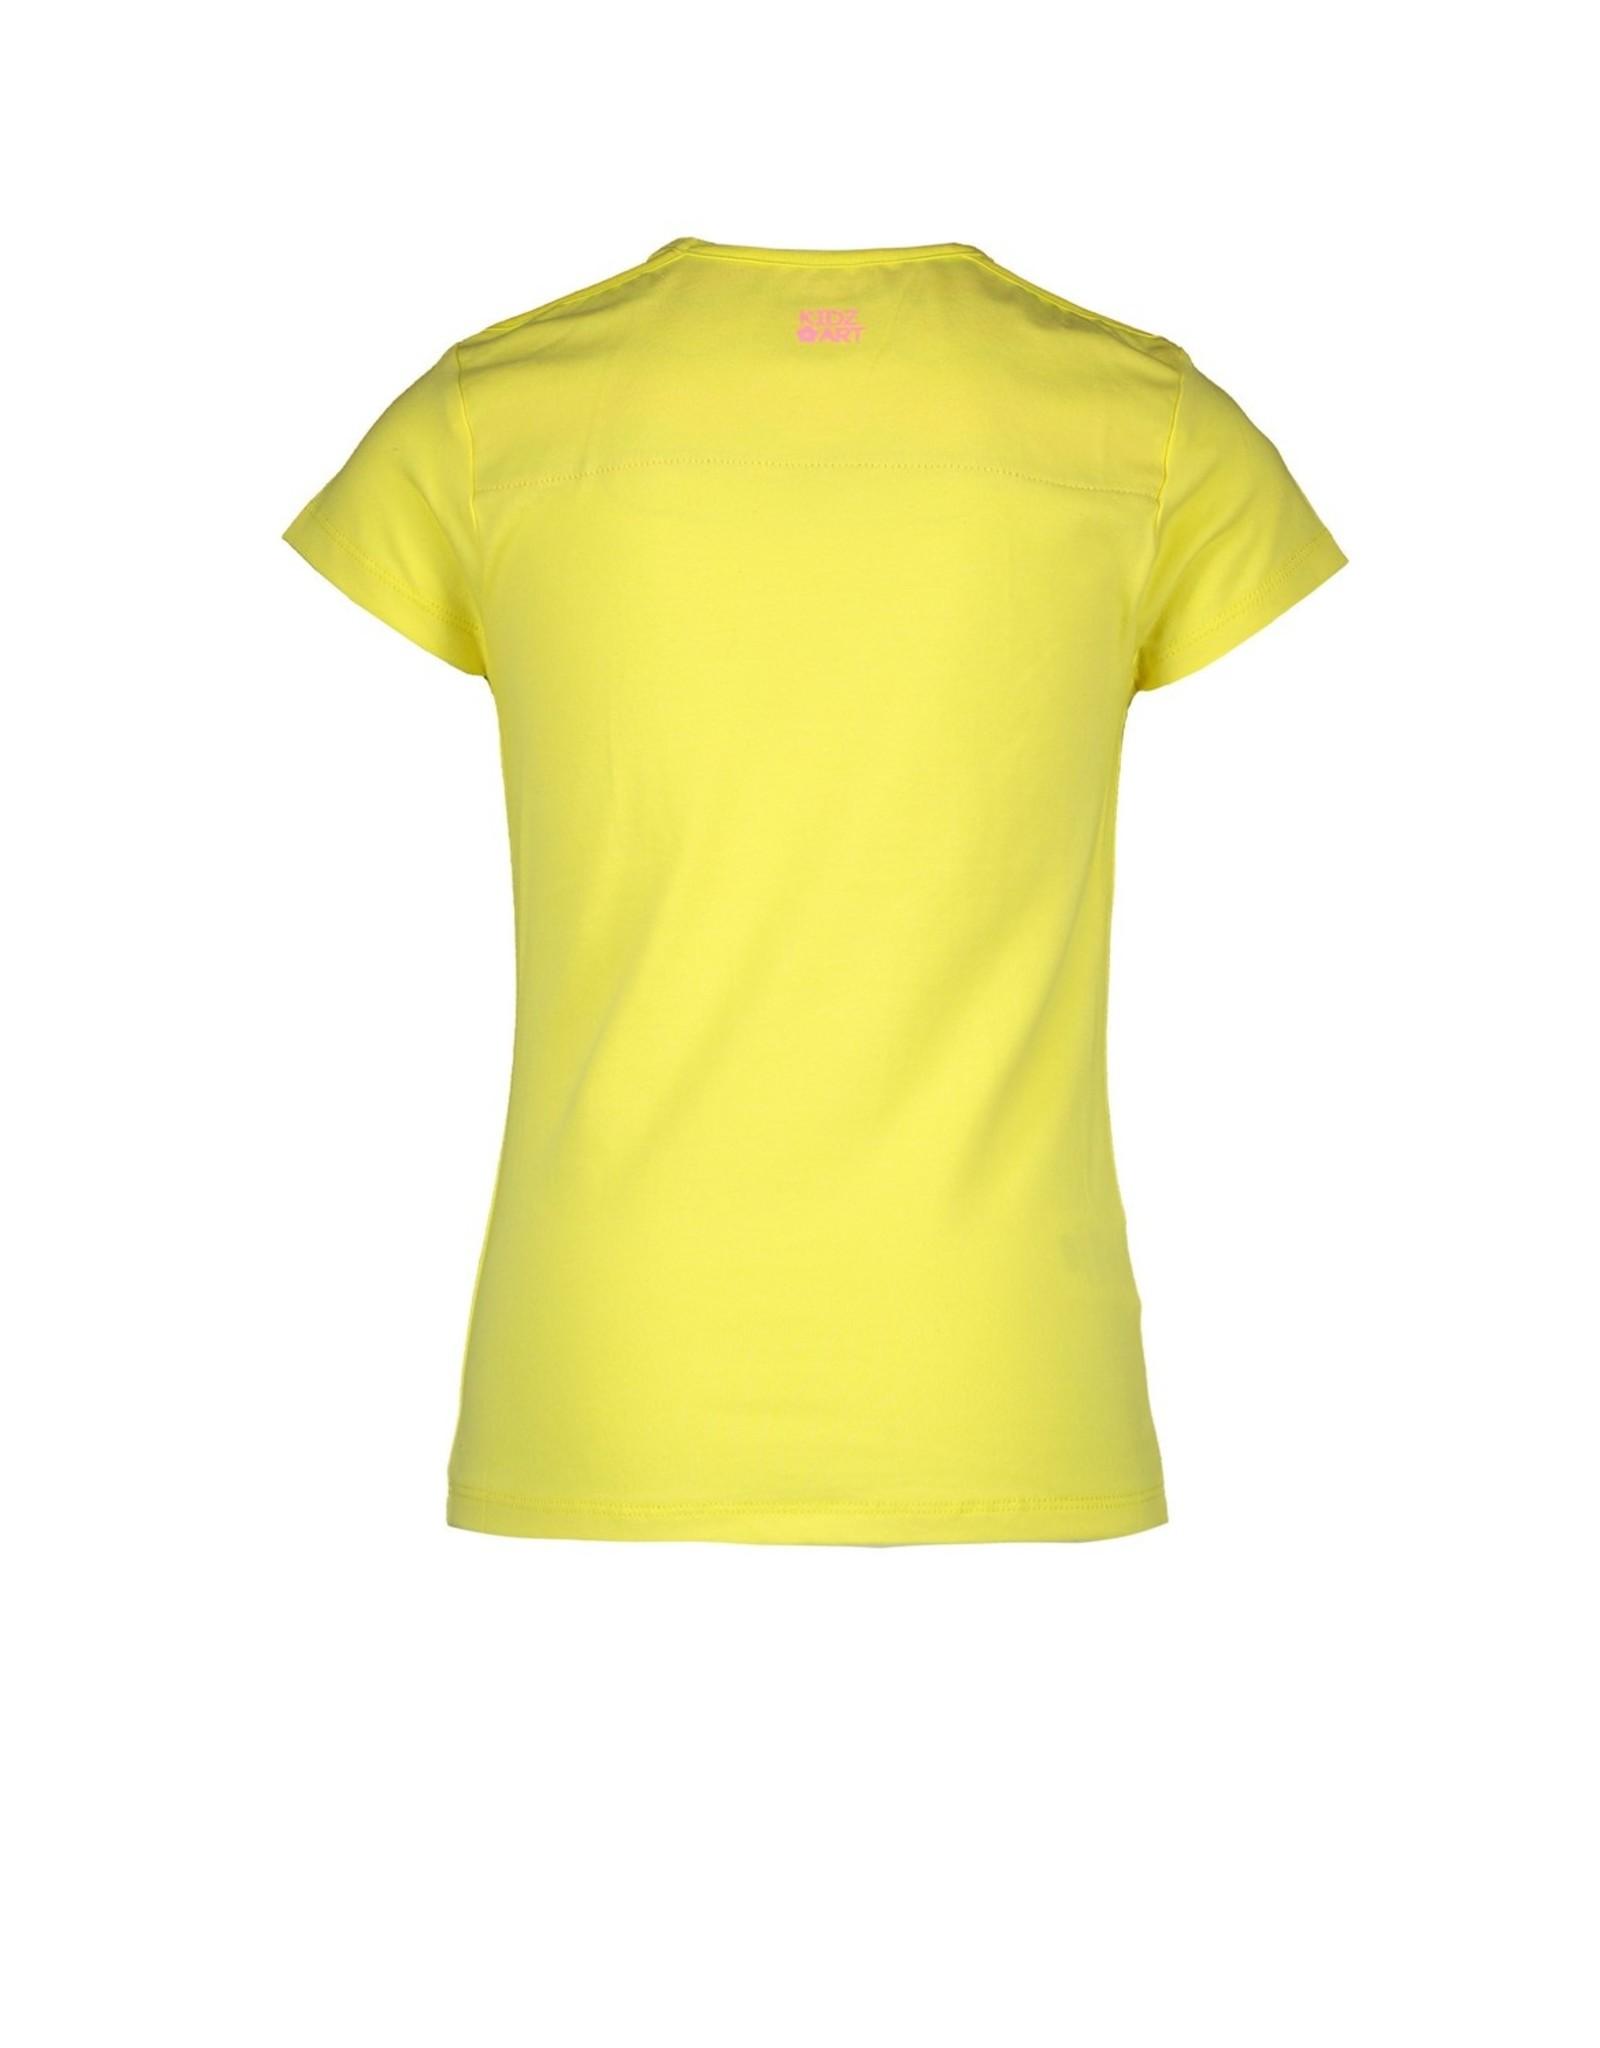 Kidz-Art T-shirt s/s plain panel print CONFETTI